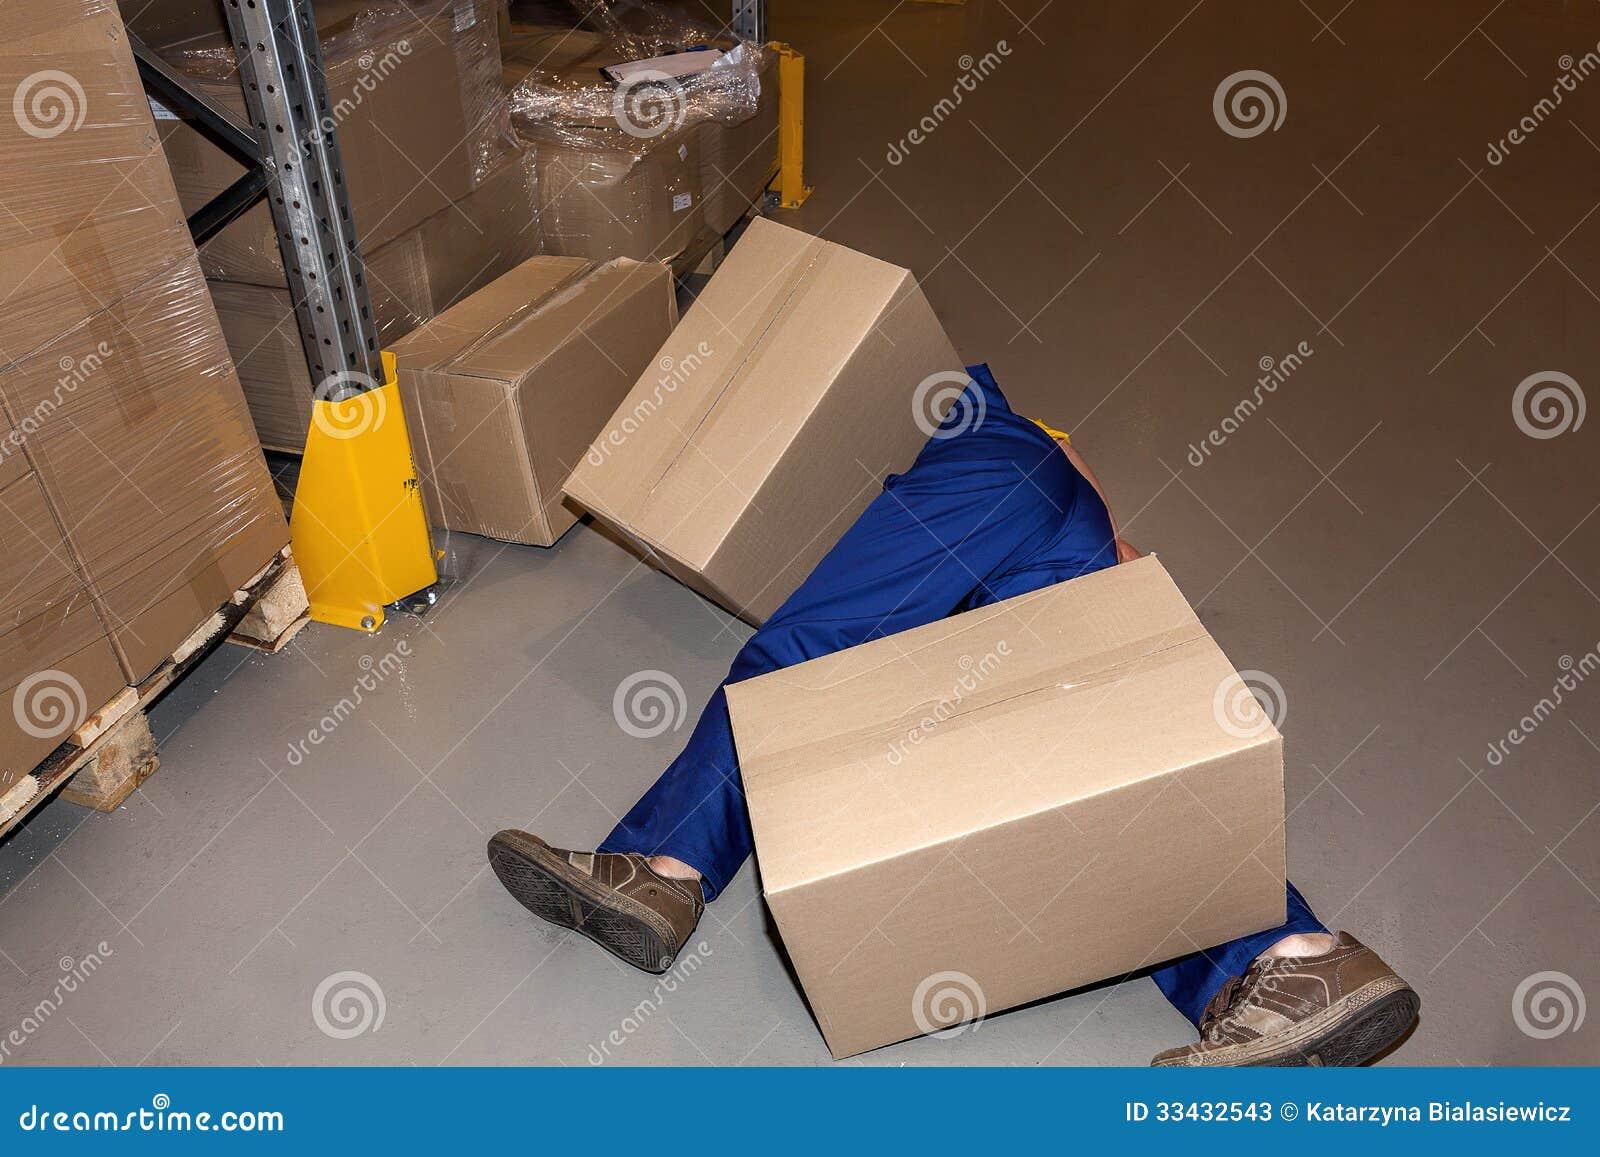 accident du travail image stock image du danger conteneur 33432543. Black Bedroom Furniture Sets. Home Design Ideas